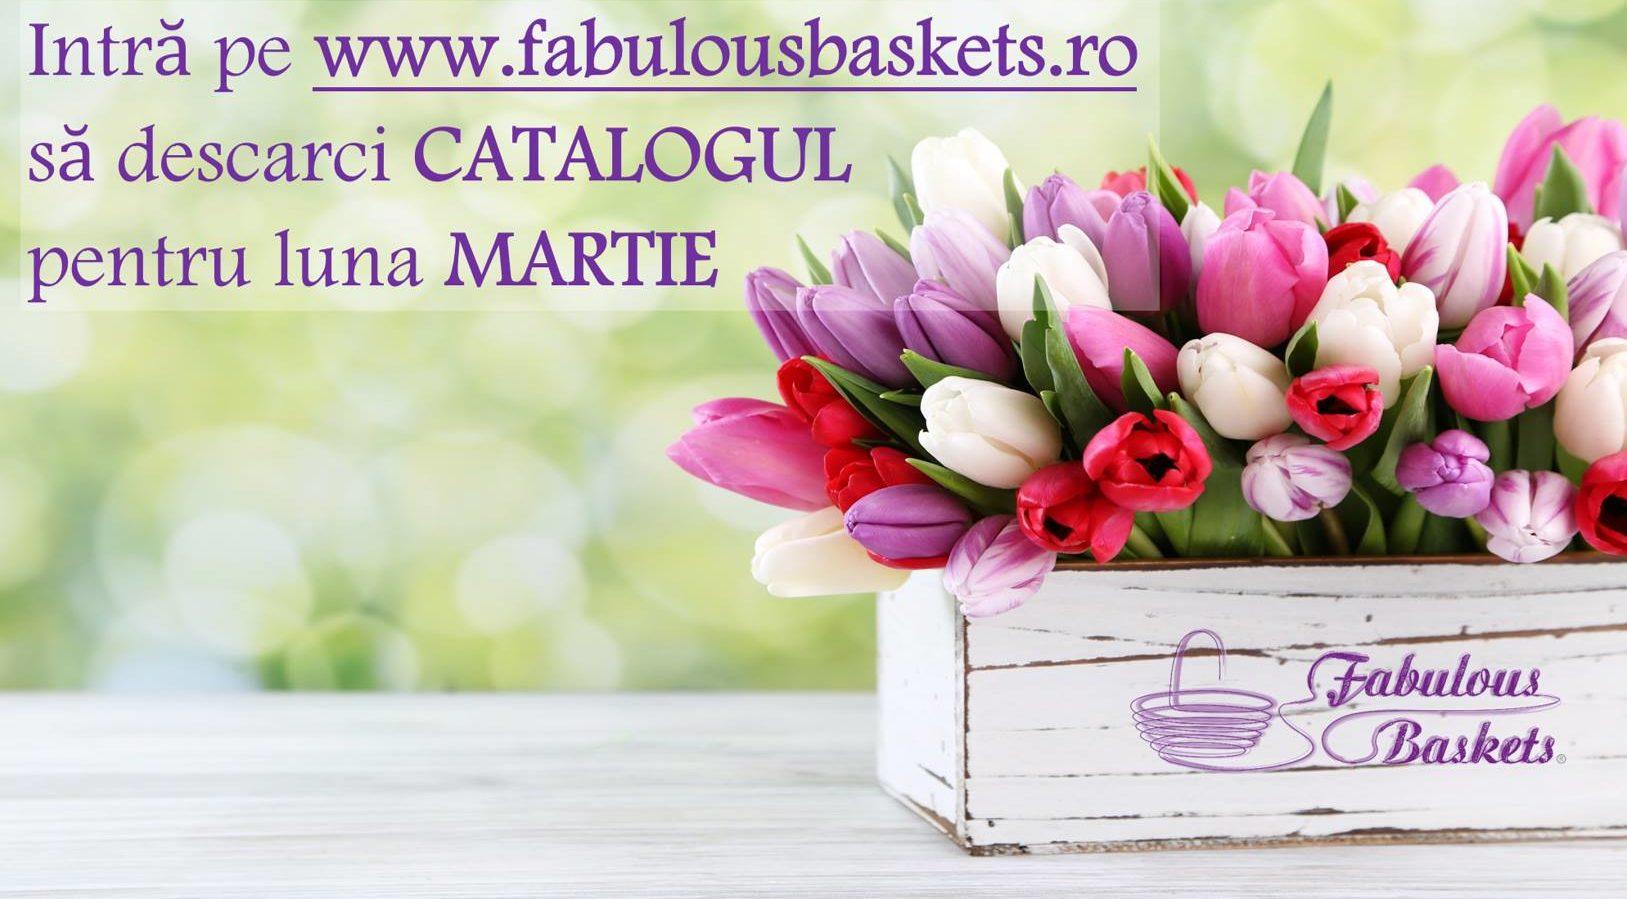 cropped-Banner-Fabulous-Baskets-1.jpg